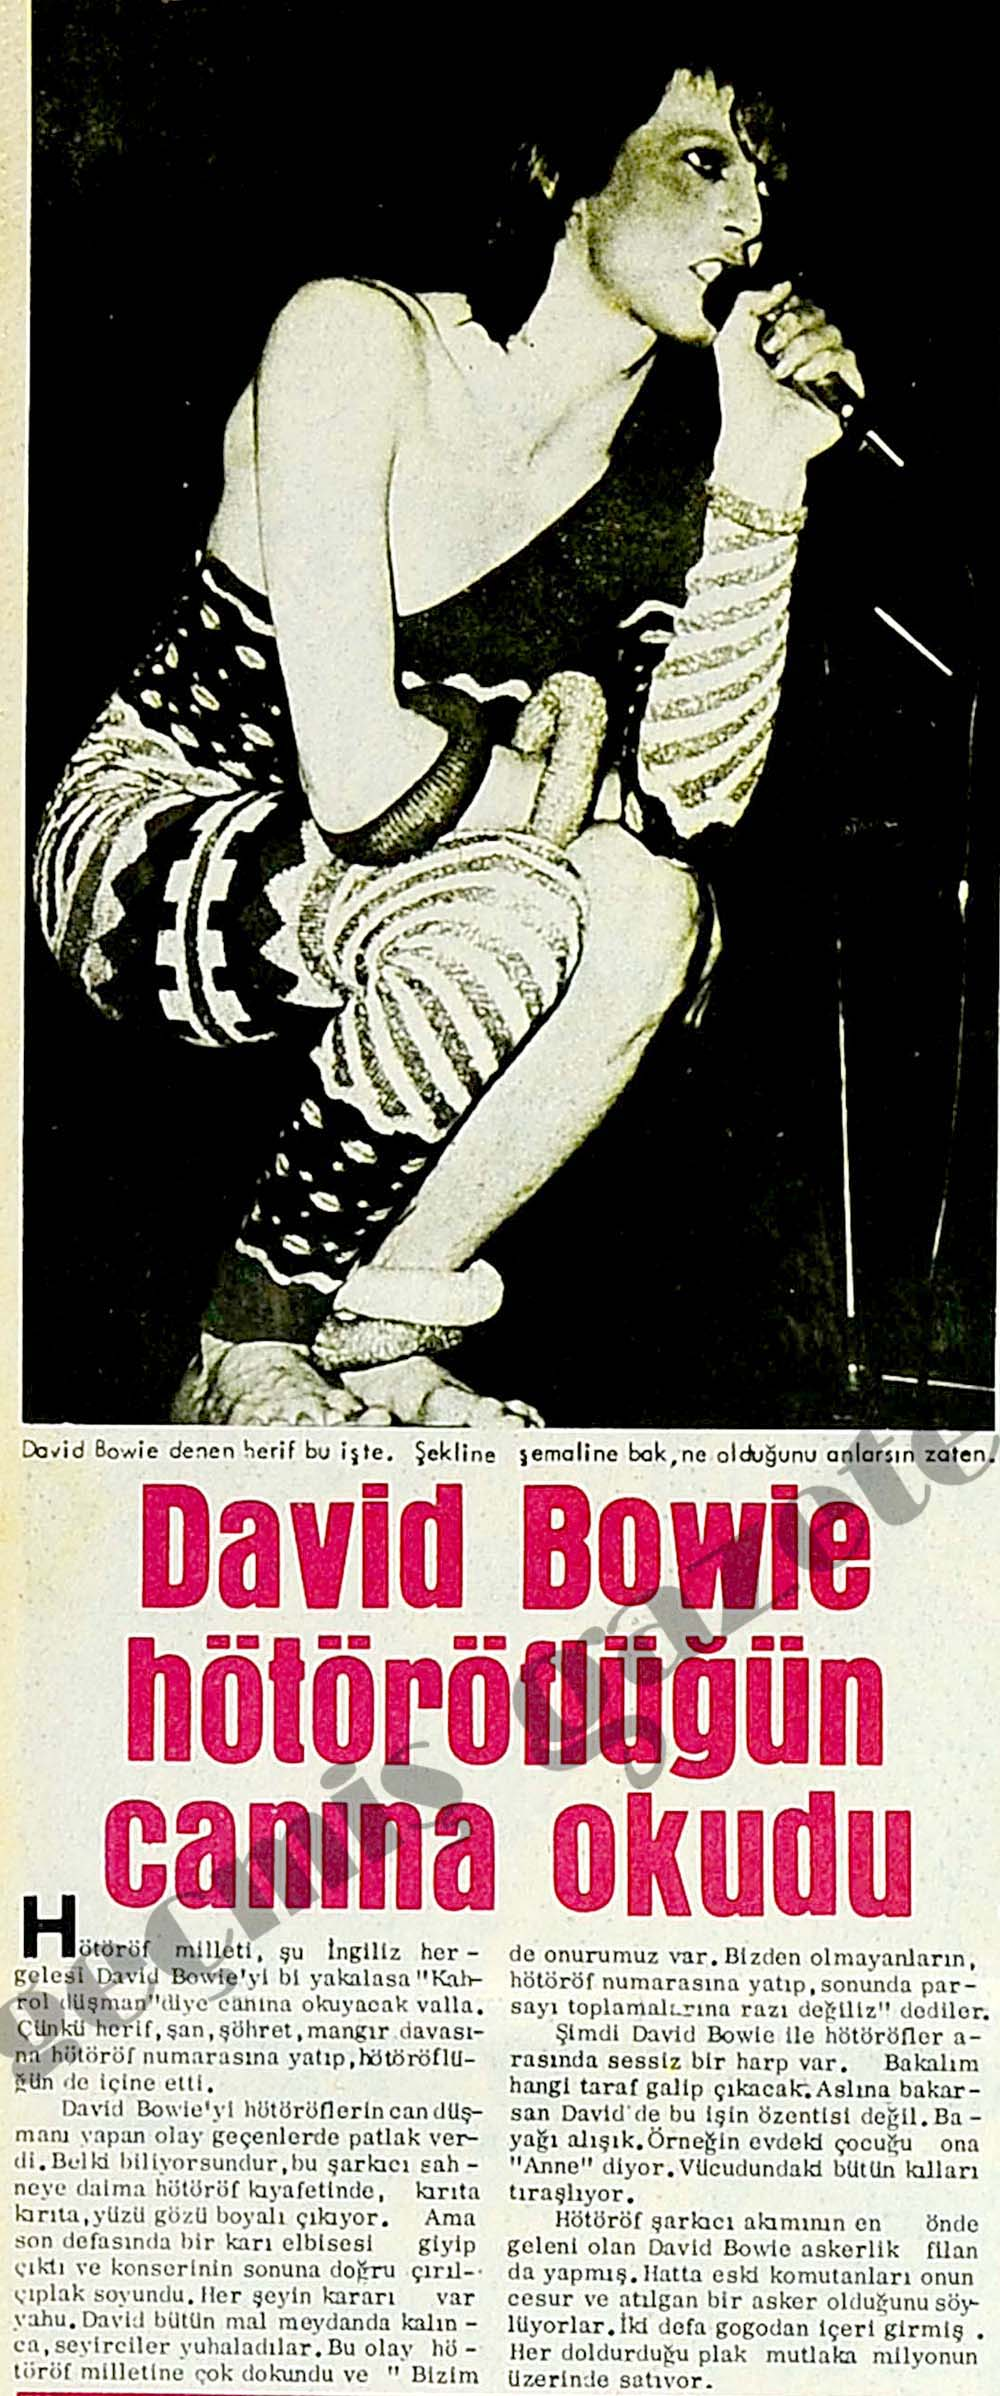 David Bowie hötöröflüğün canına okudu